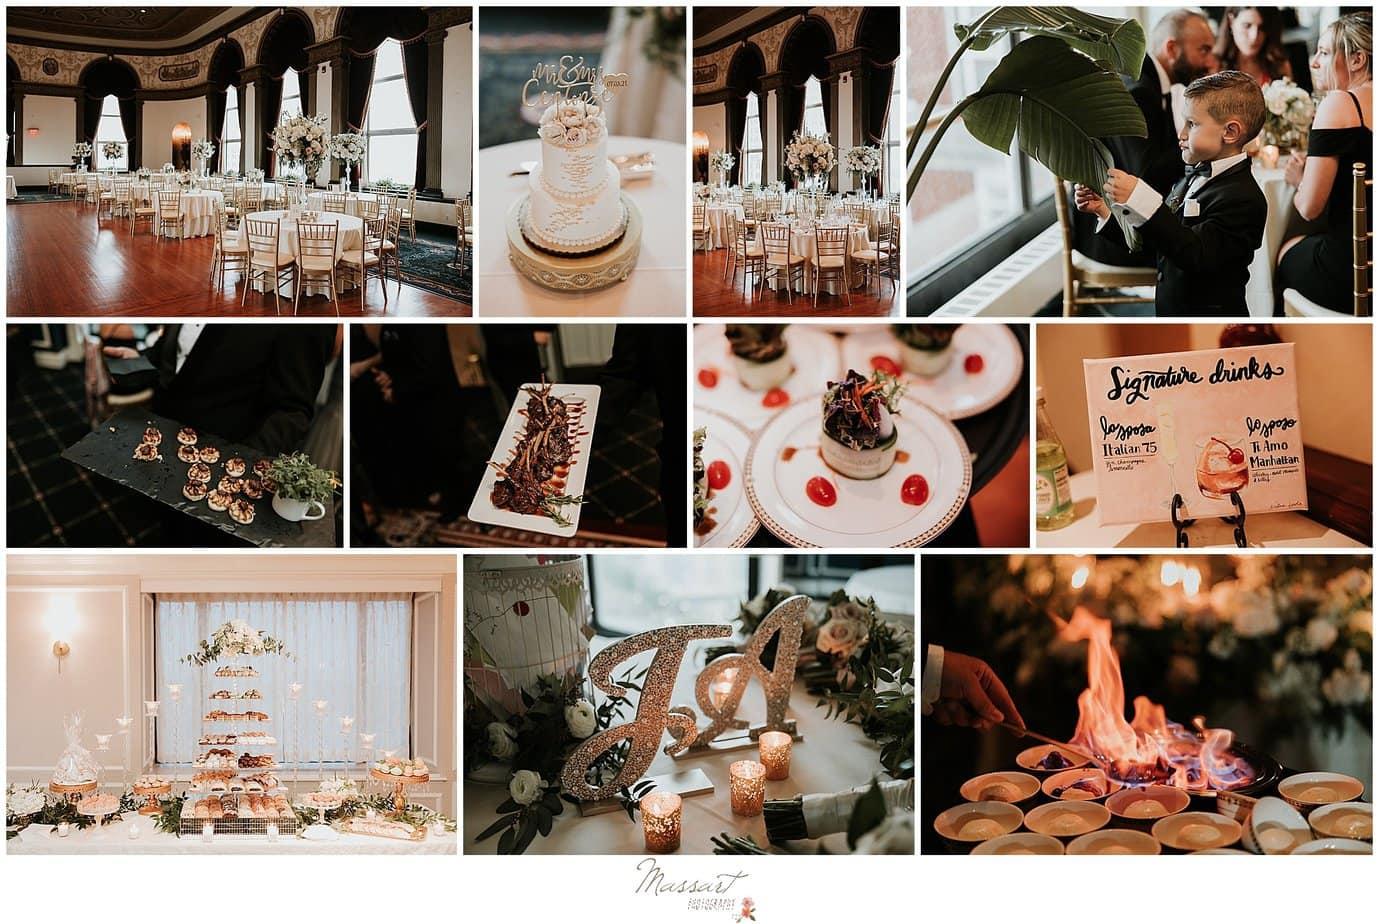 The Graduate Hotel wedding reception details